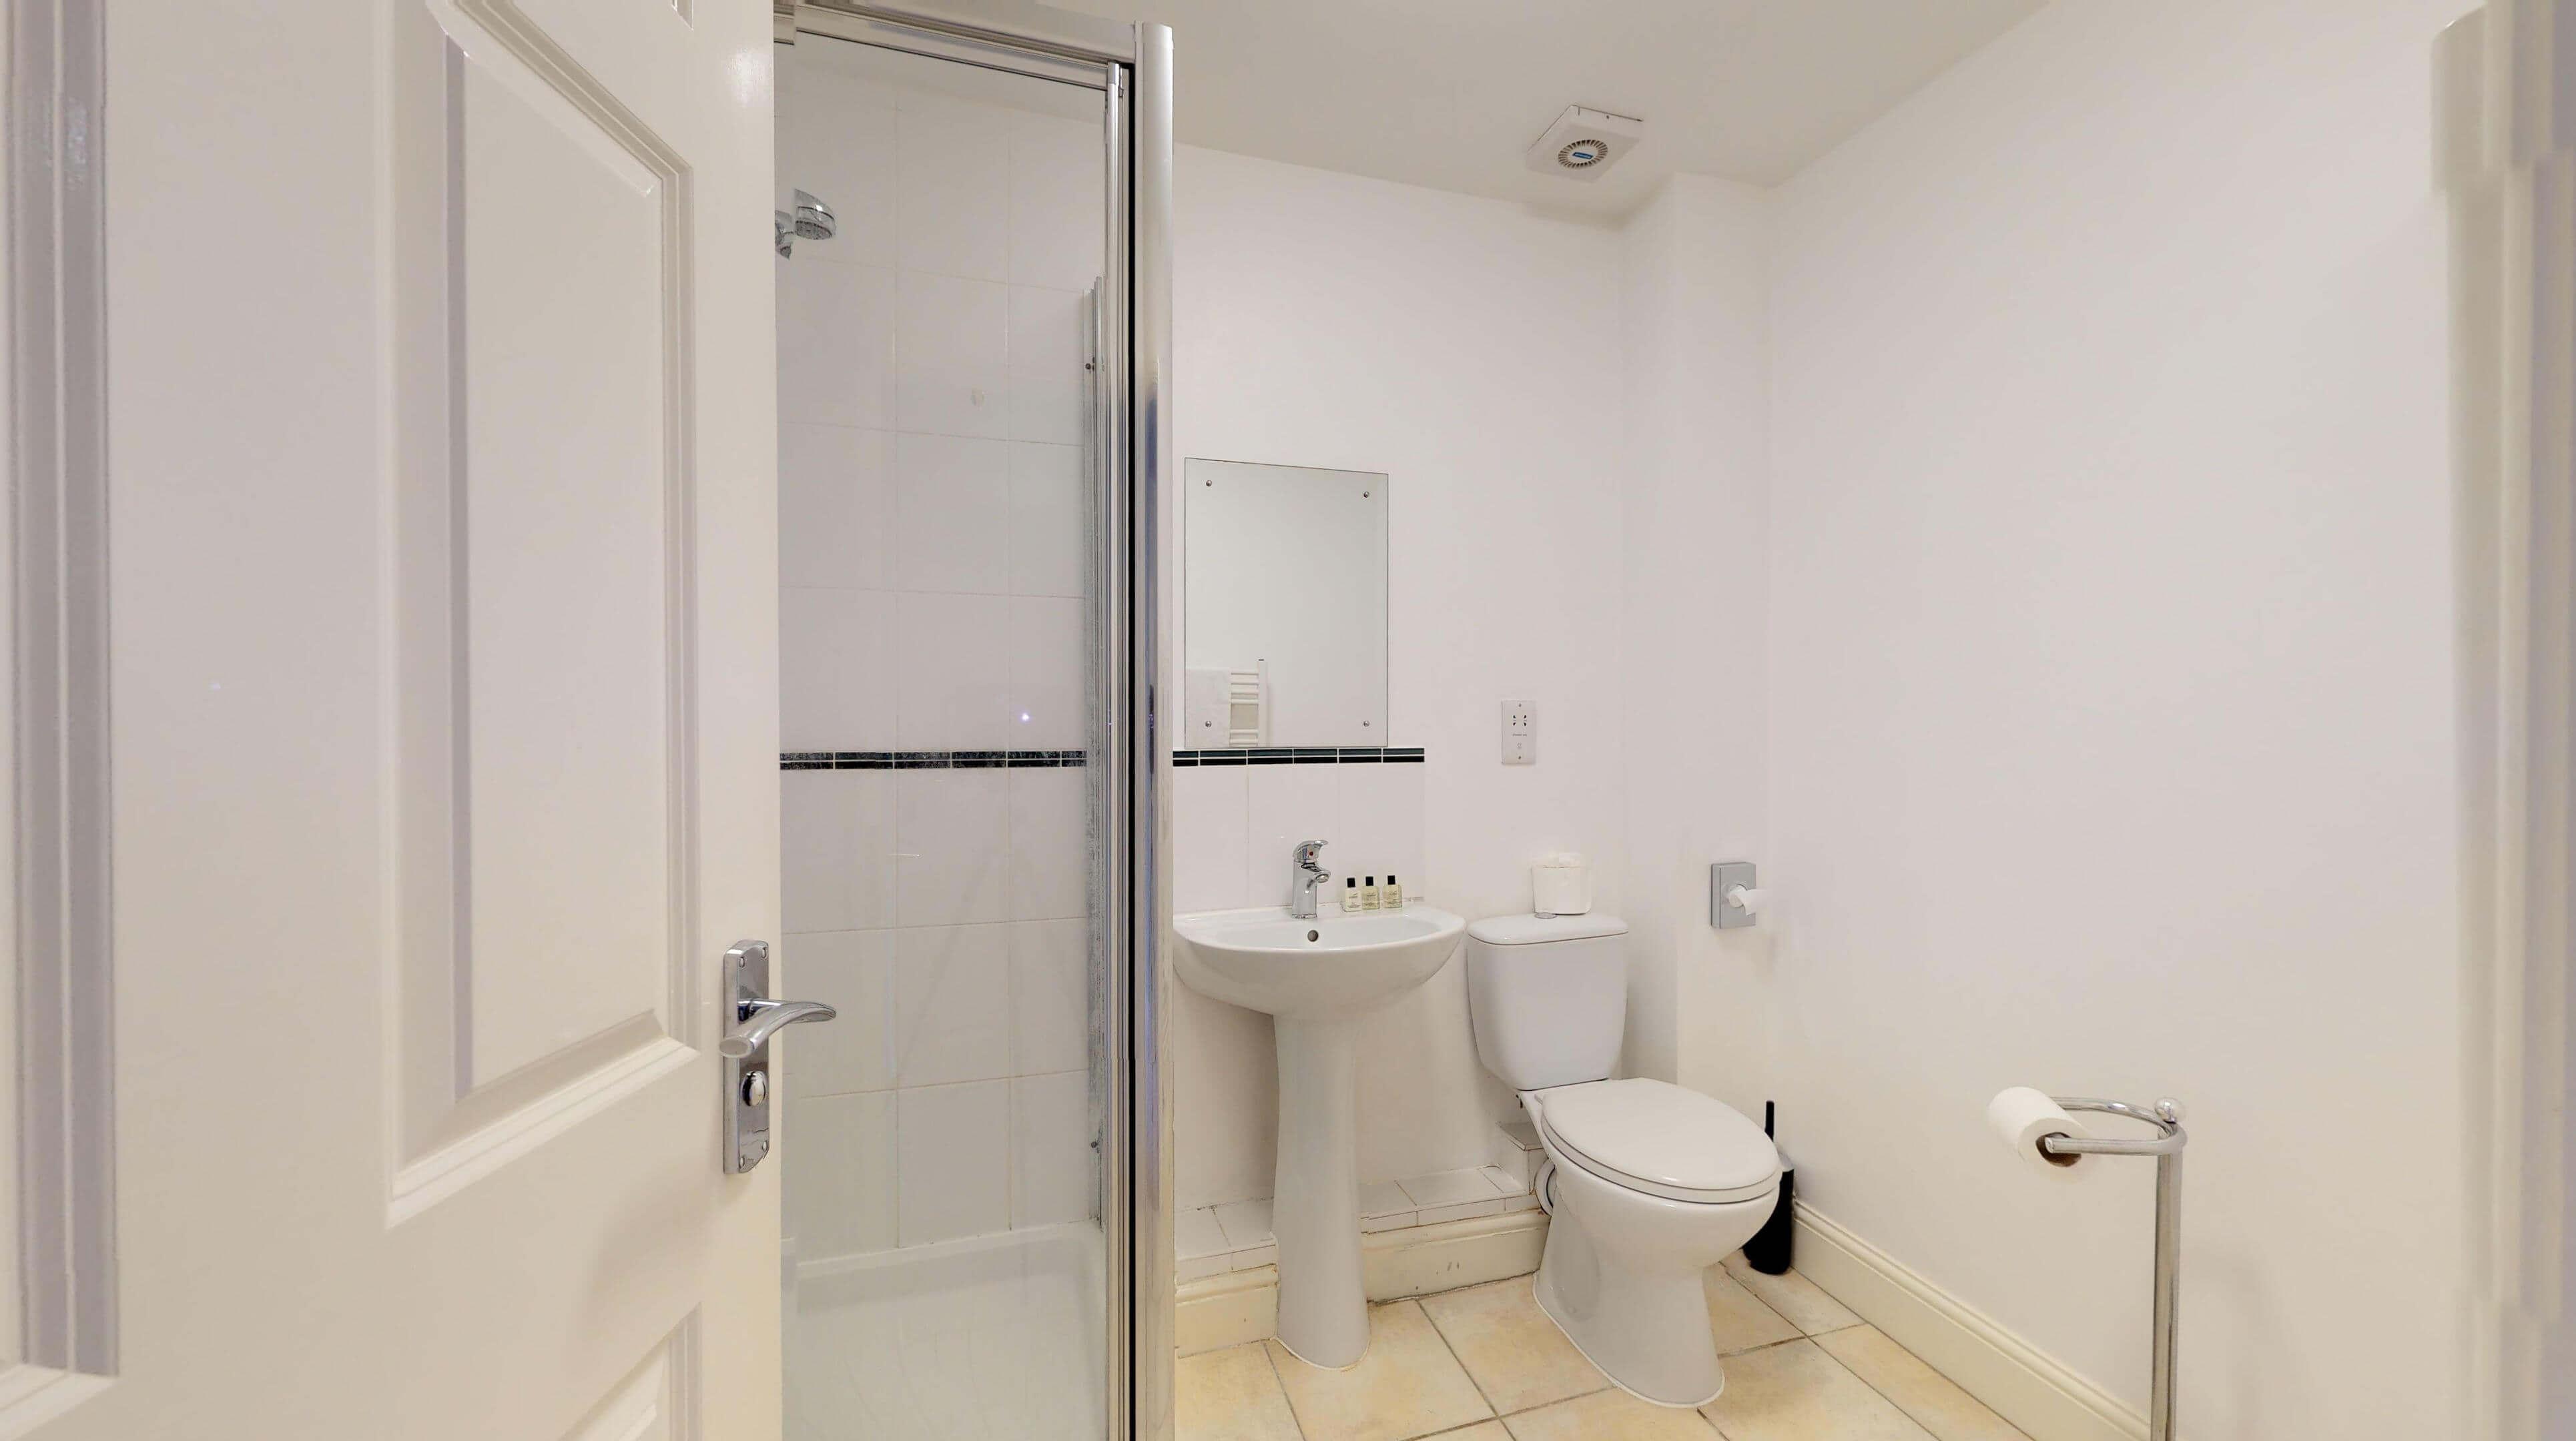 Oxford Serviced Apartments Hensington Suite Bedroom One Ensuite